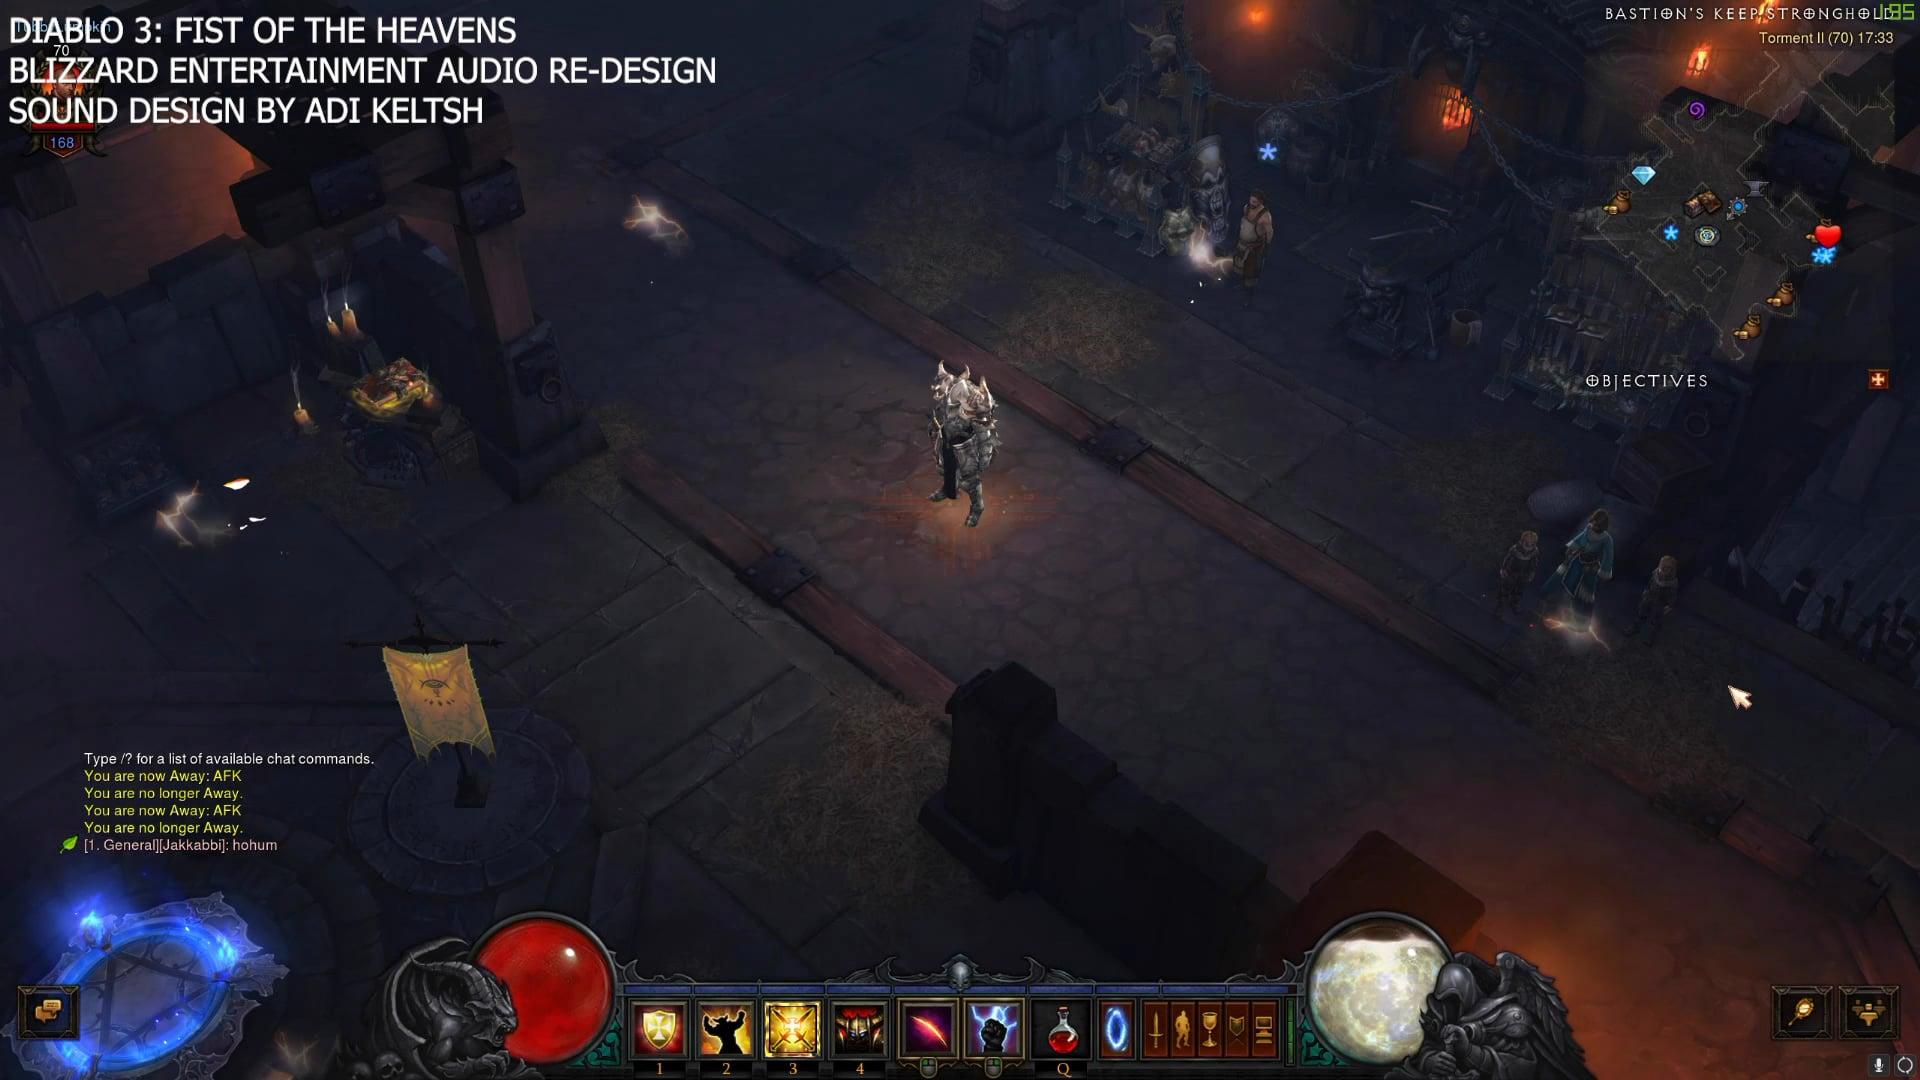 Diablo III: Fist Of The Heavens Sound Re-Design